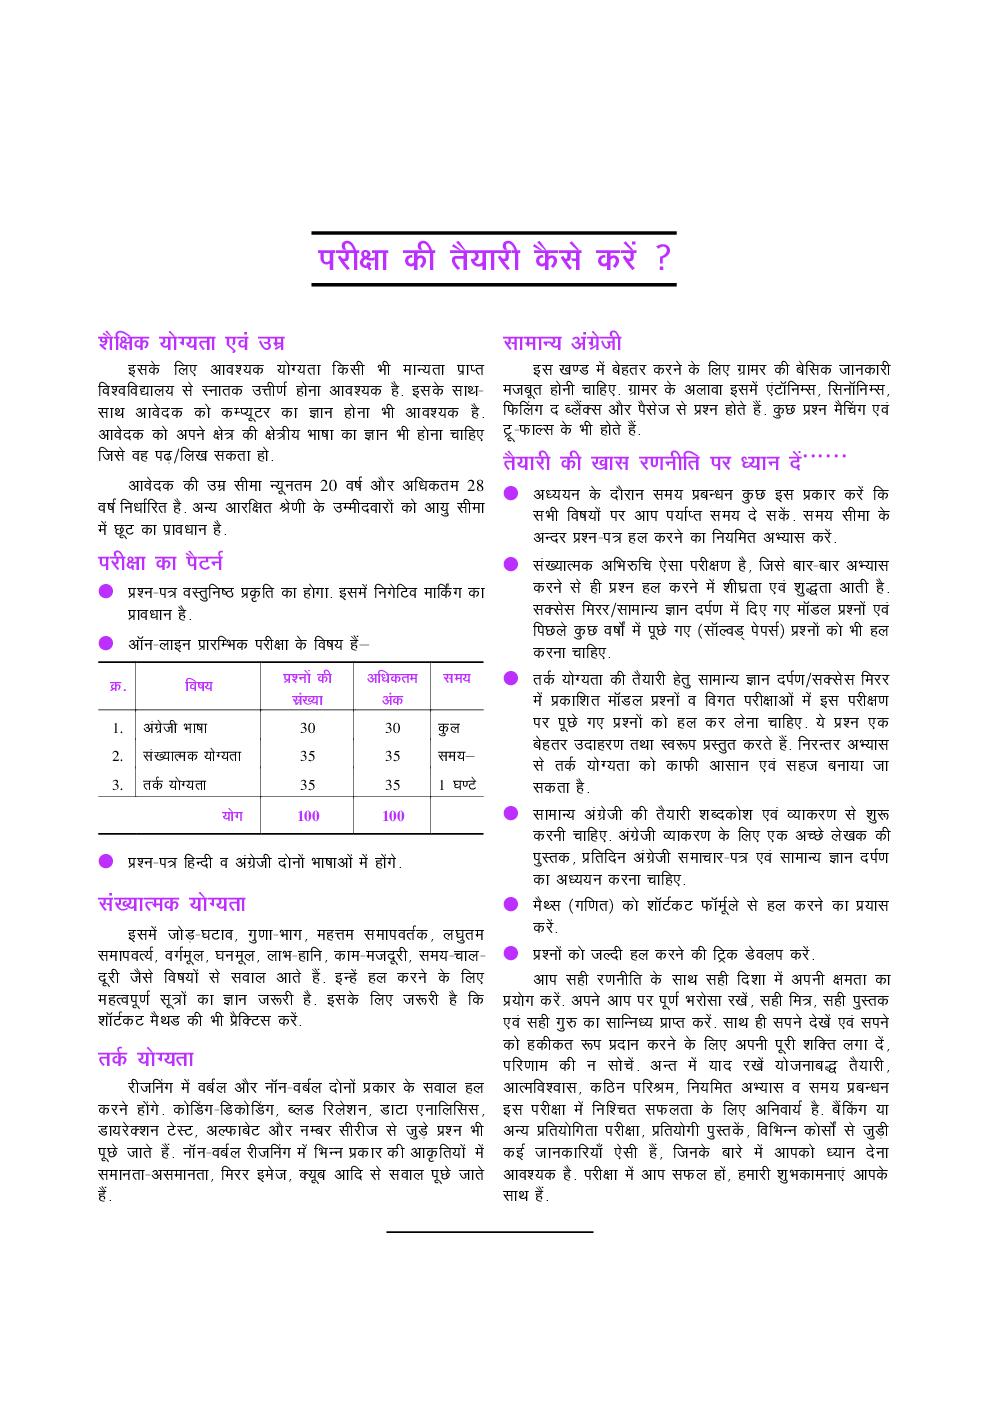 प्रैक्टिस सेट बैंक लिपिकीय संवर्ग सम्मिलित लिखित प्रारंभिक परीक्षा - Page 5